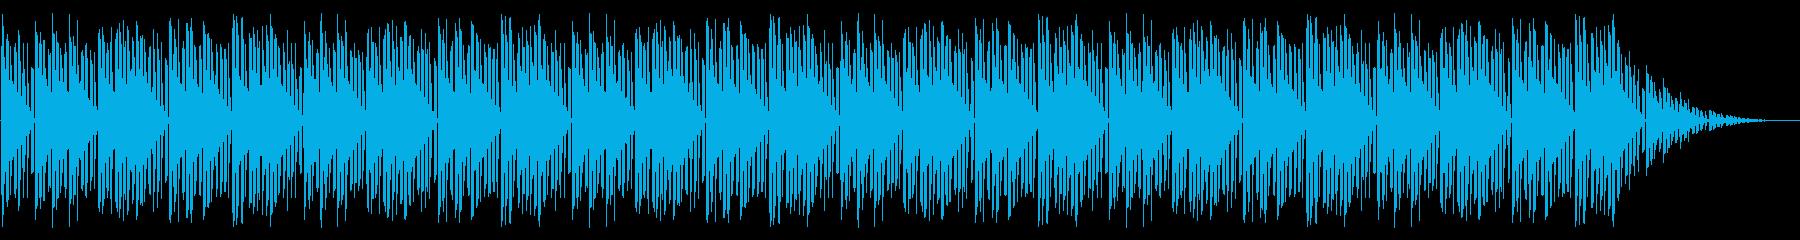 GB風アクションゲームのOP曲の再生済みの波形